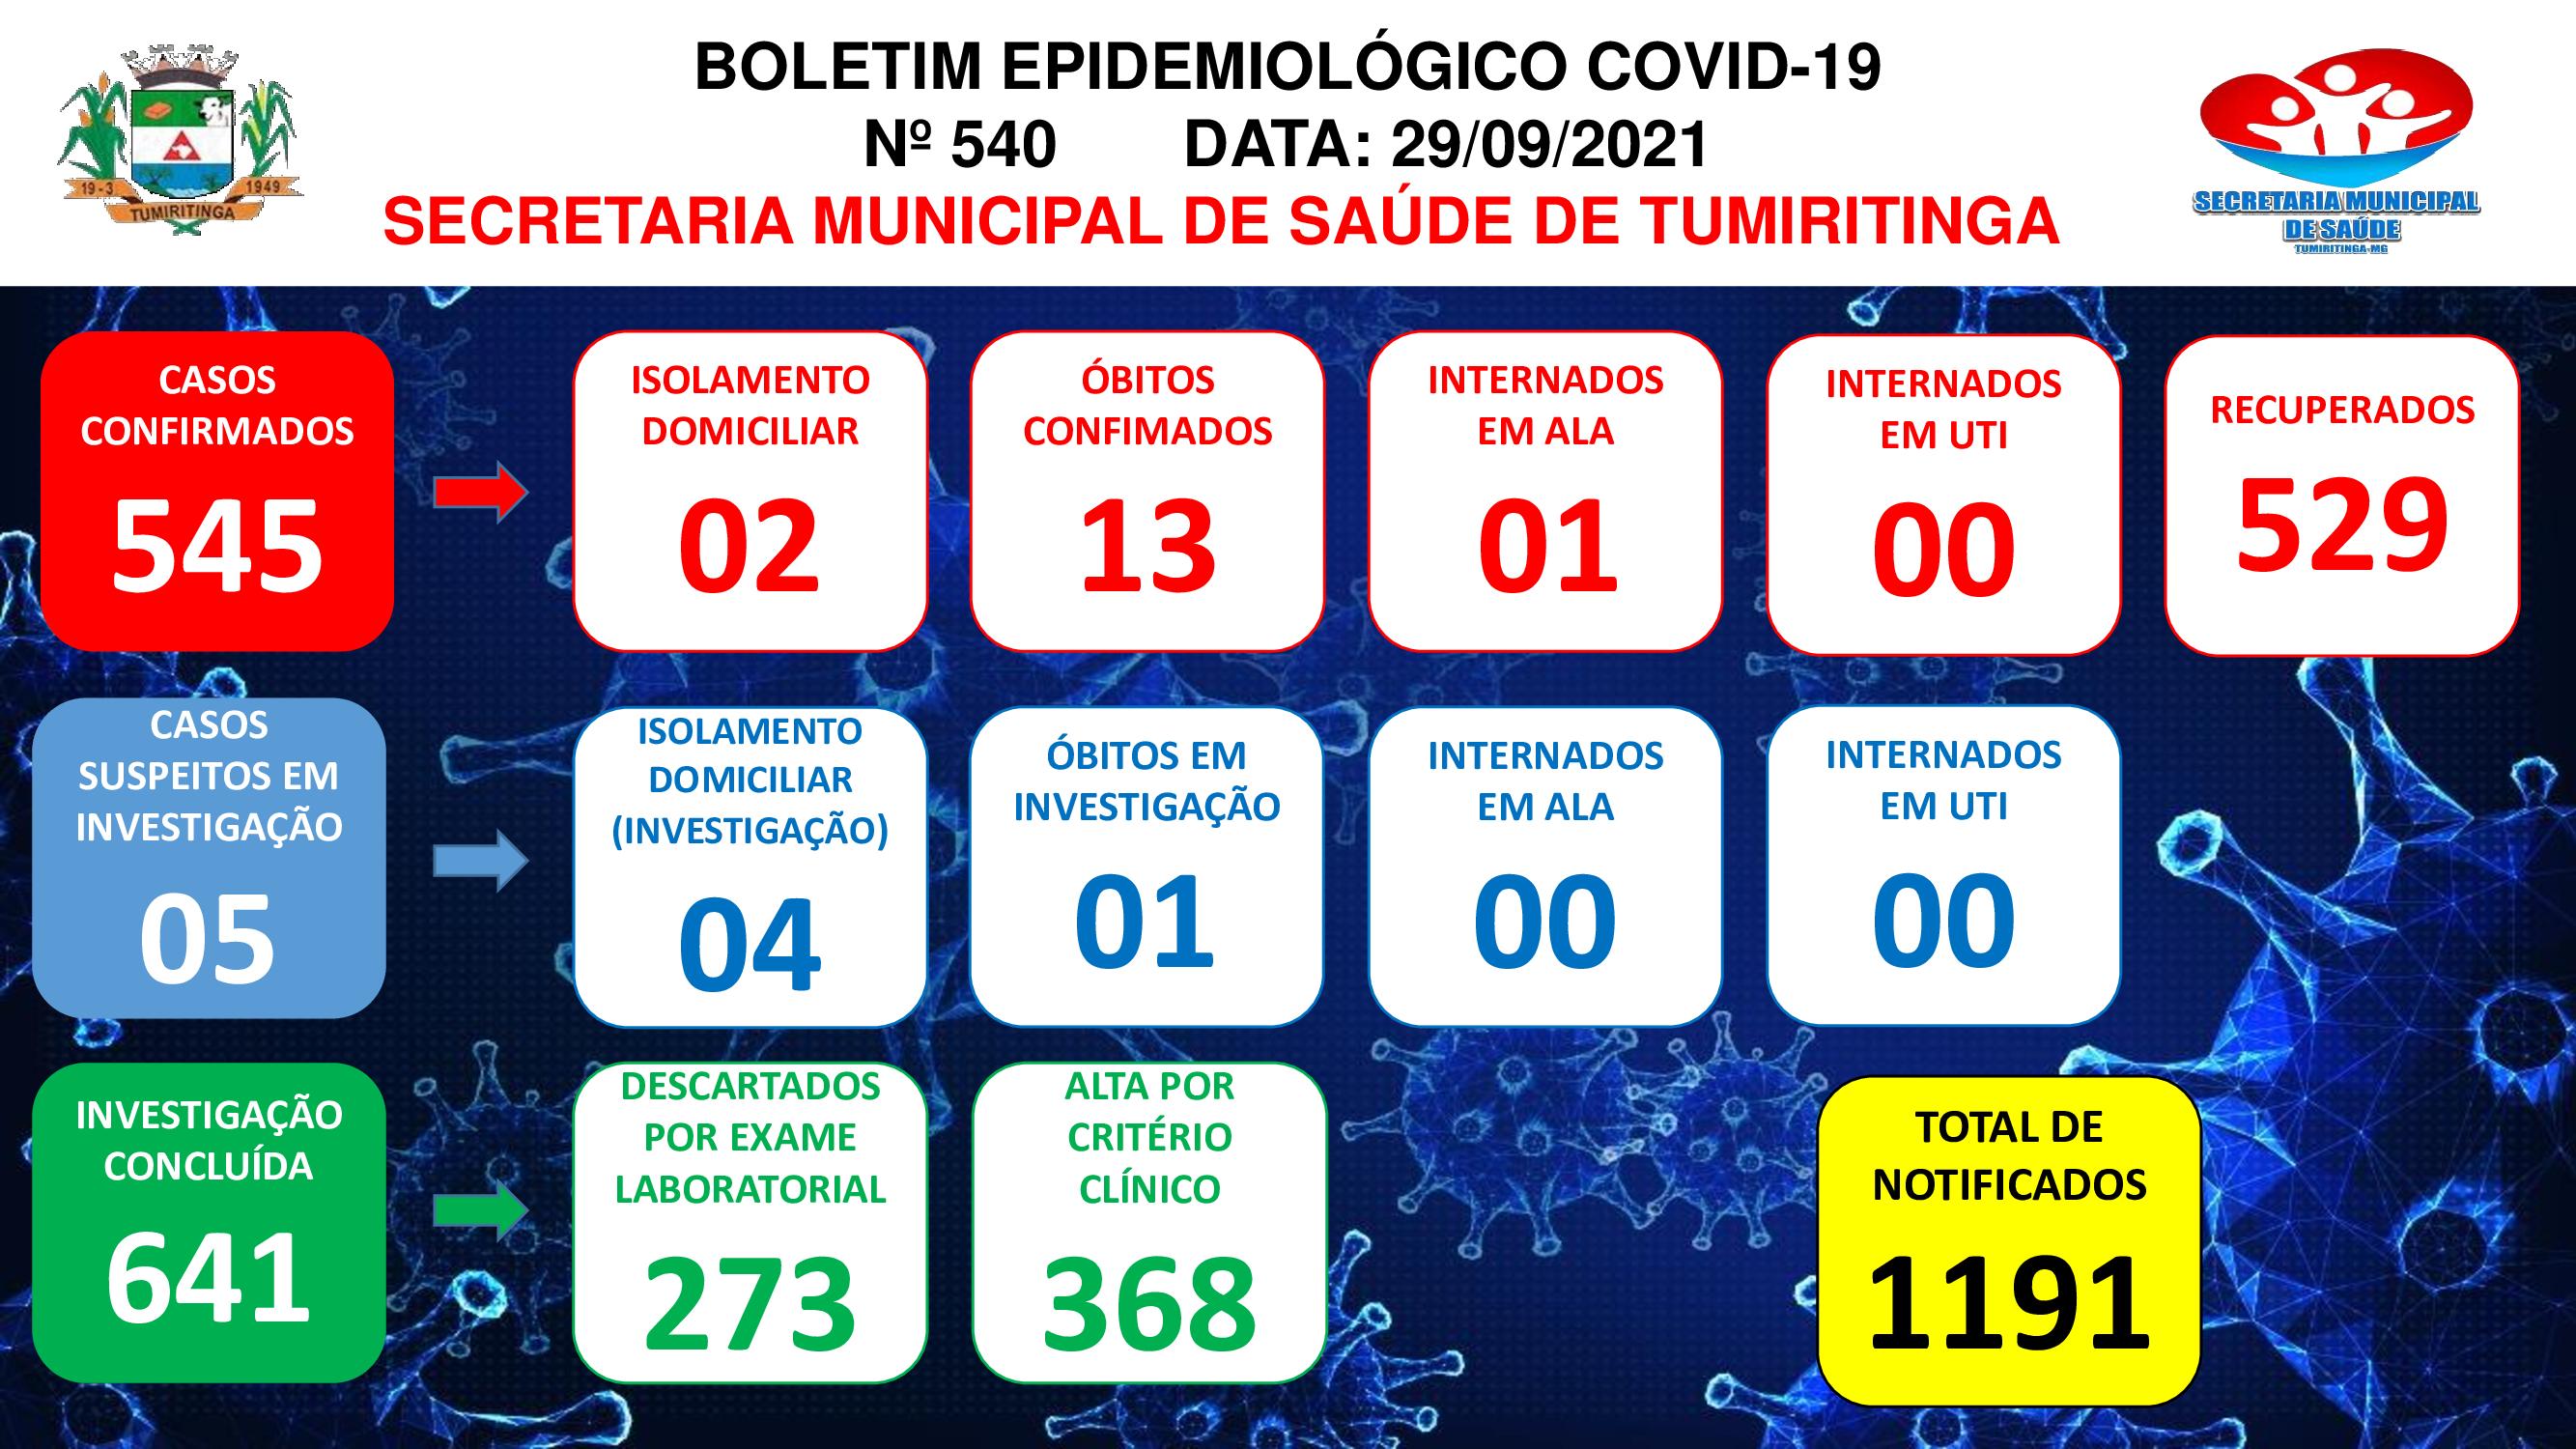 BOLETIM EPIDEMIOLÓGICO CORONAVÍRUS N° 540 - 29/09/2021